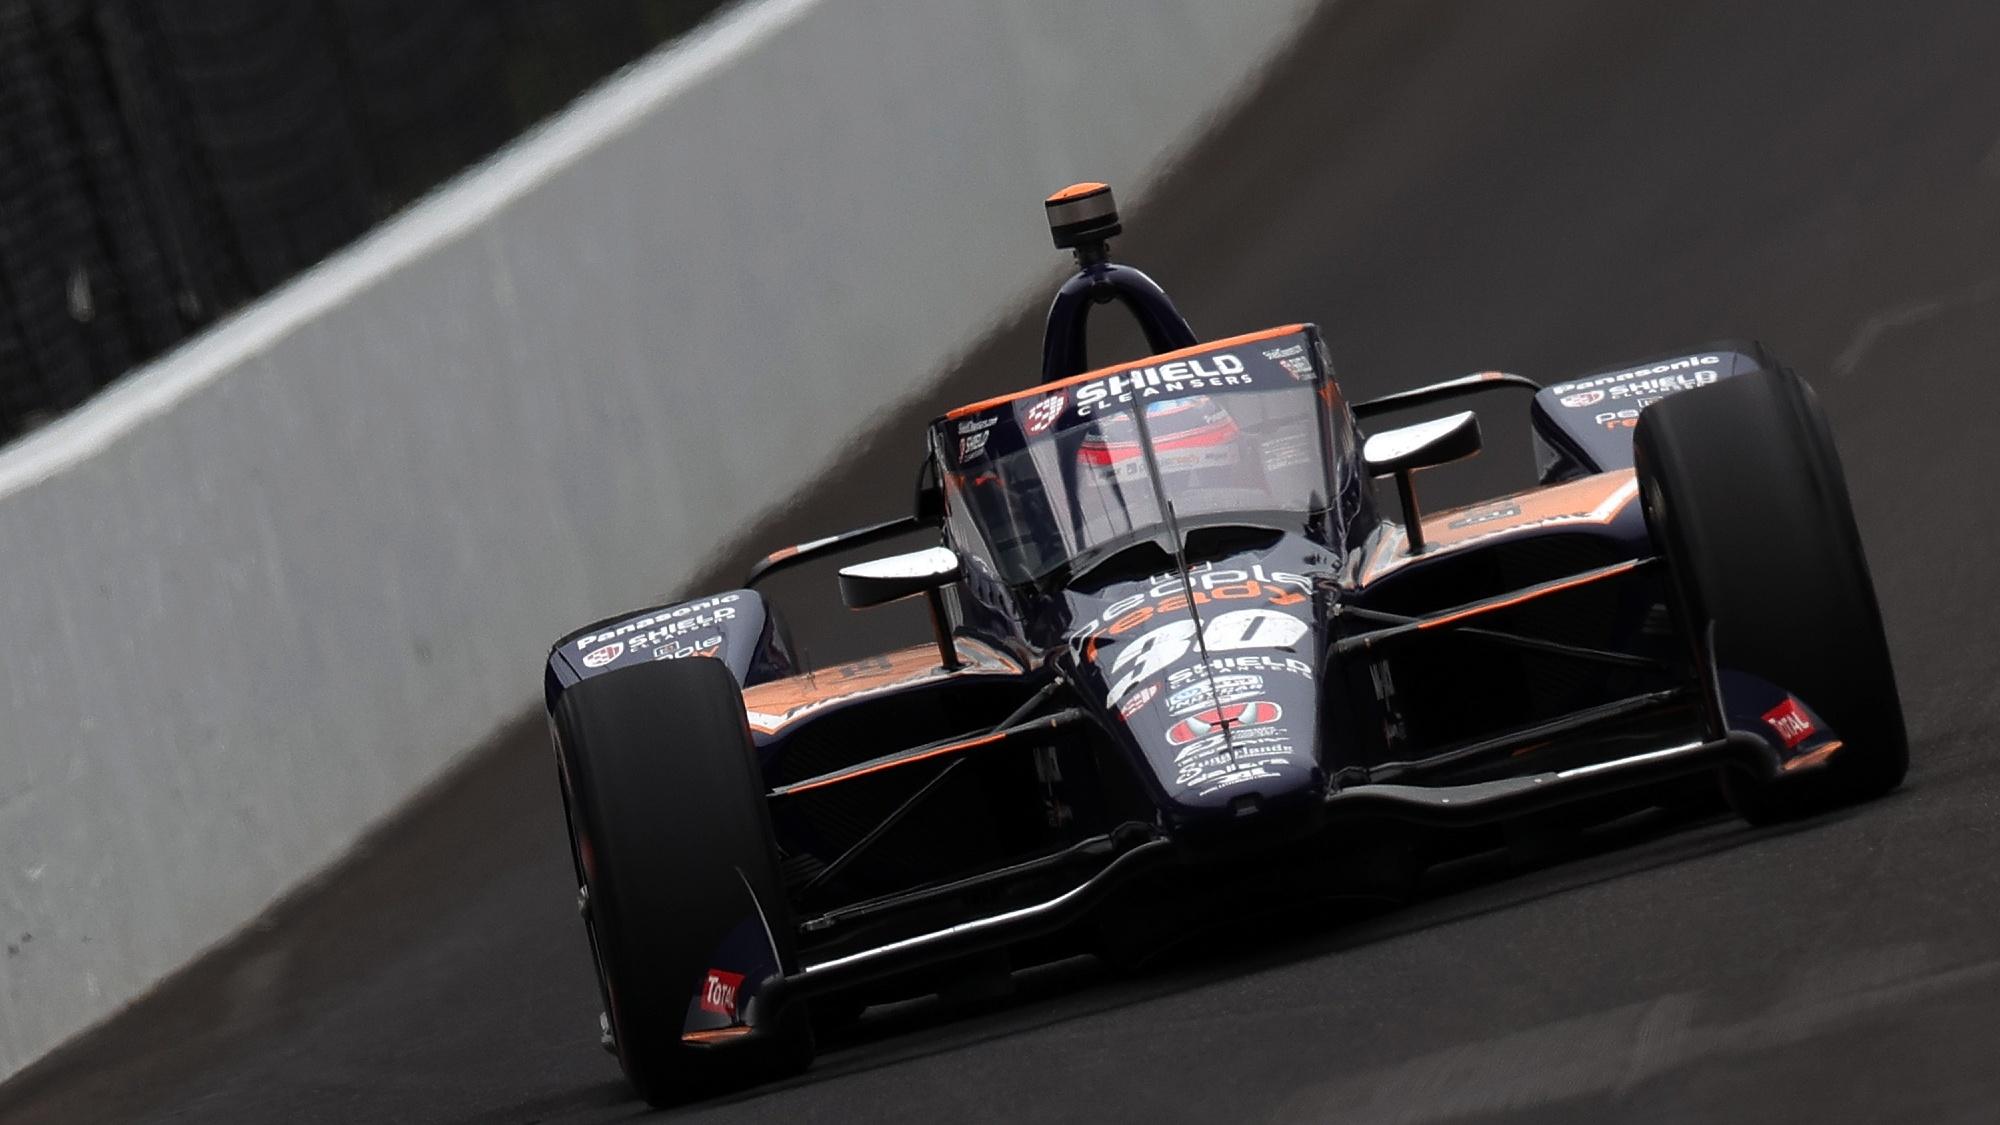 Takuma Sato, 2021 Indy 500